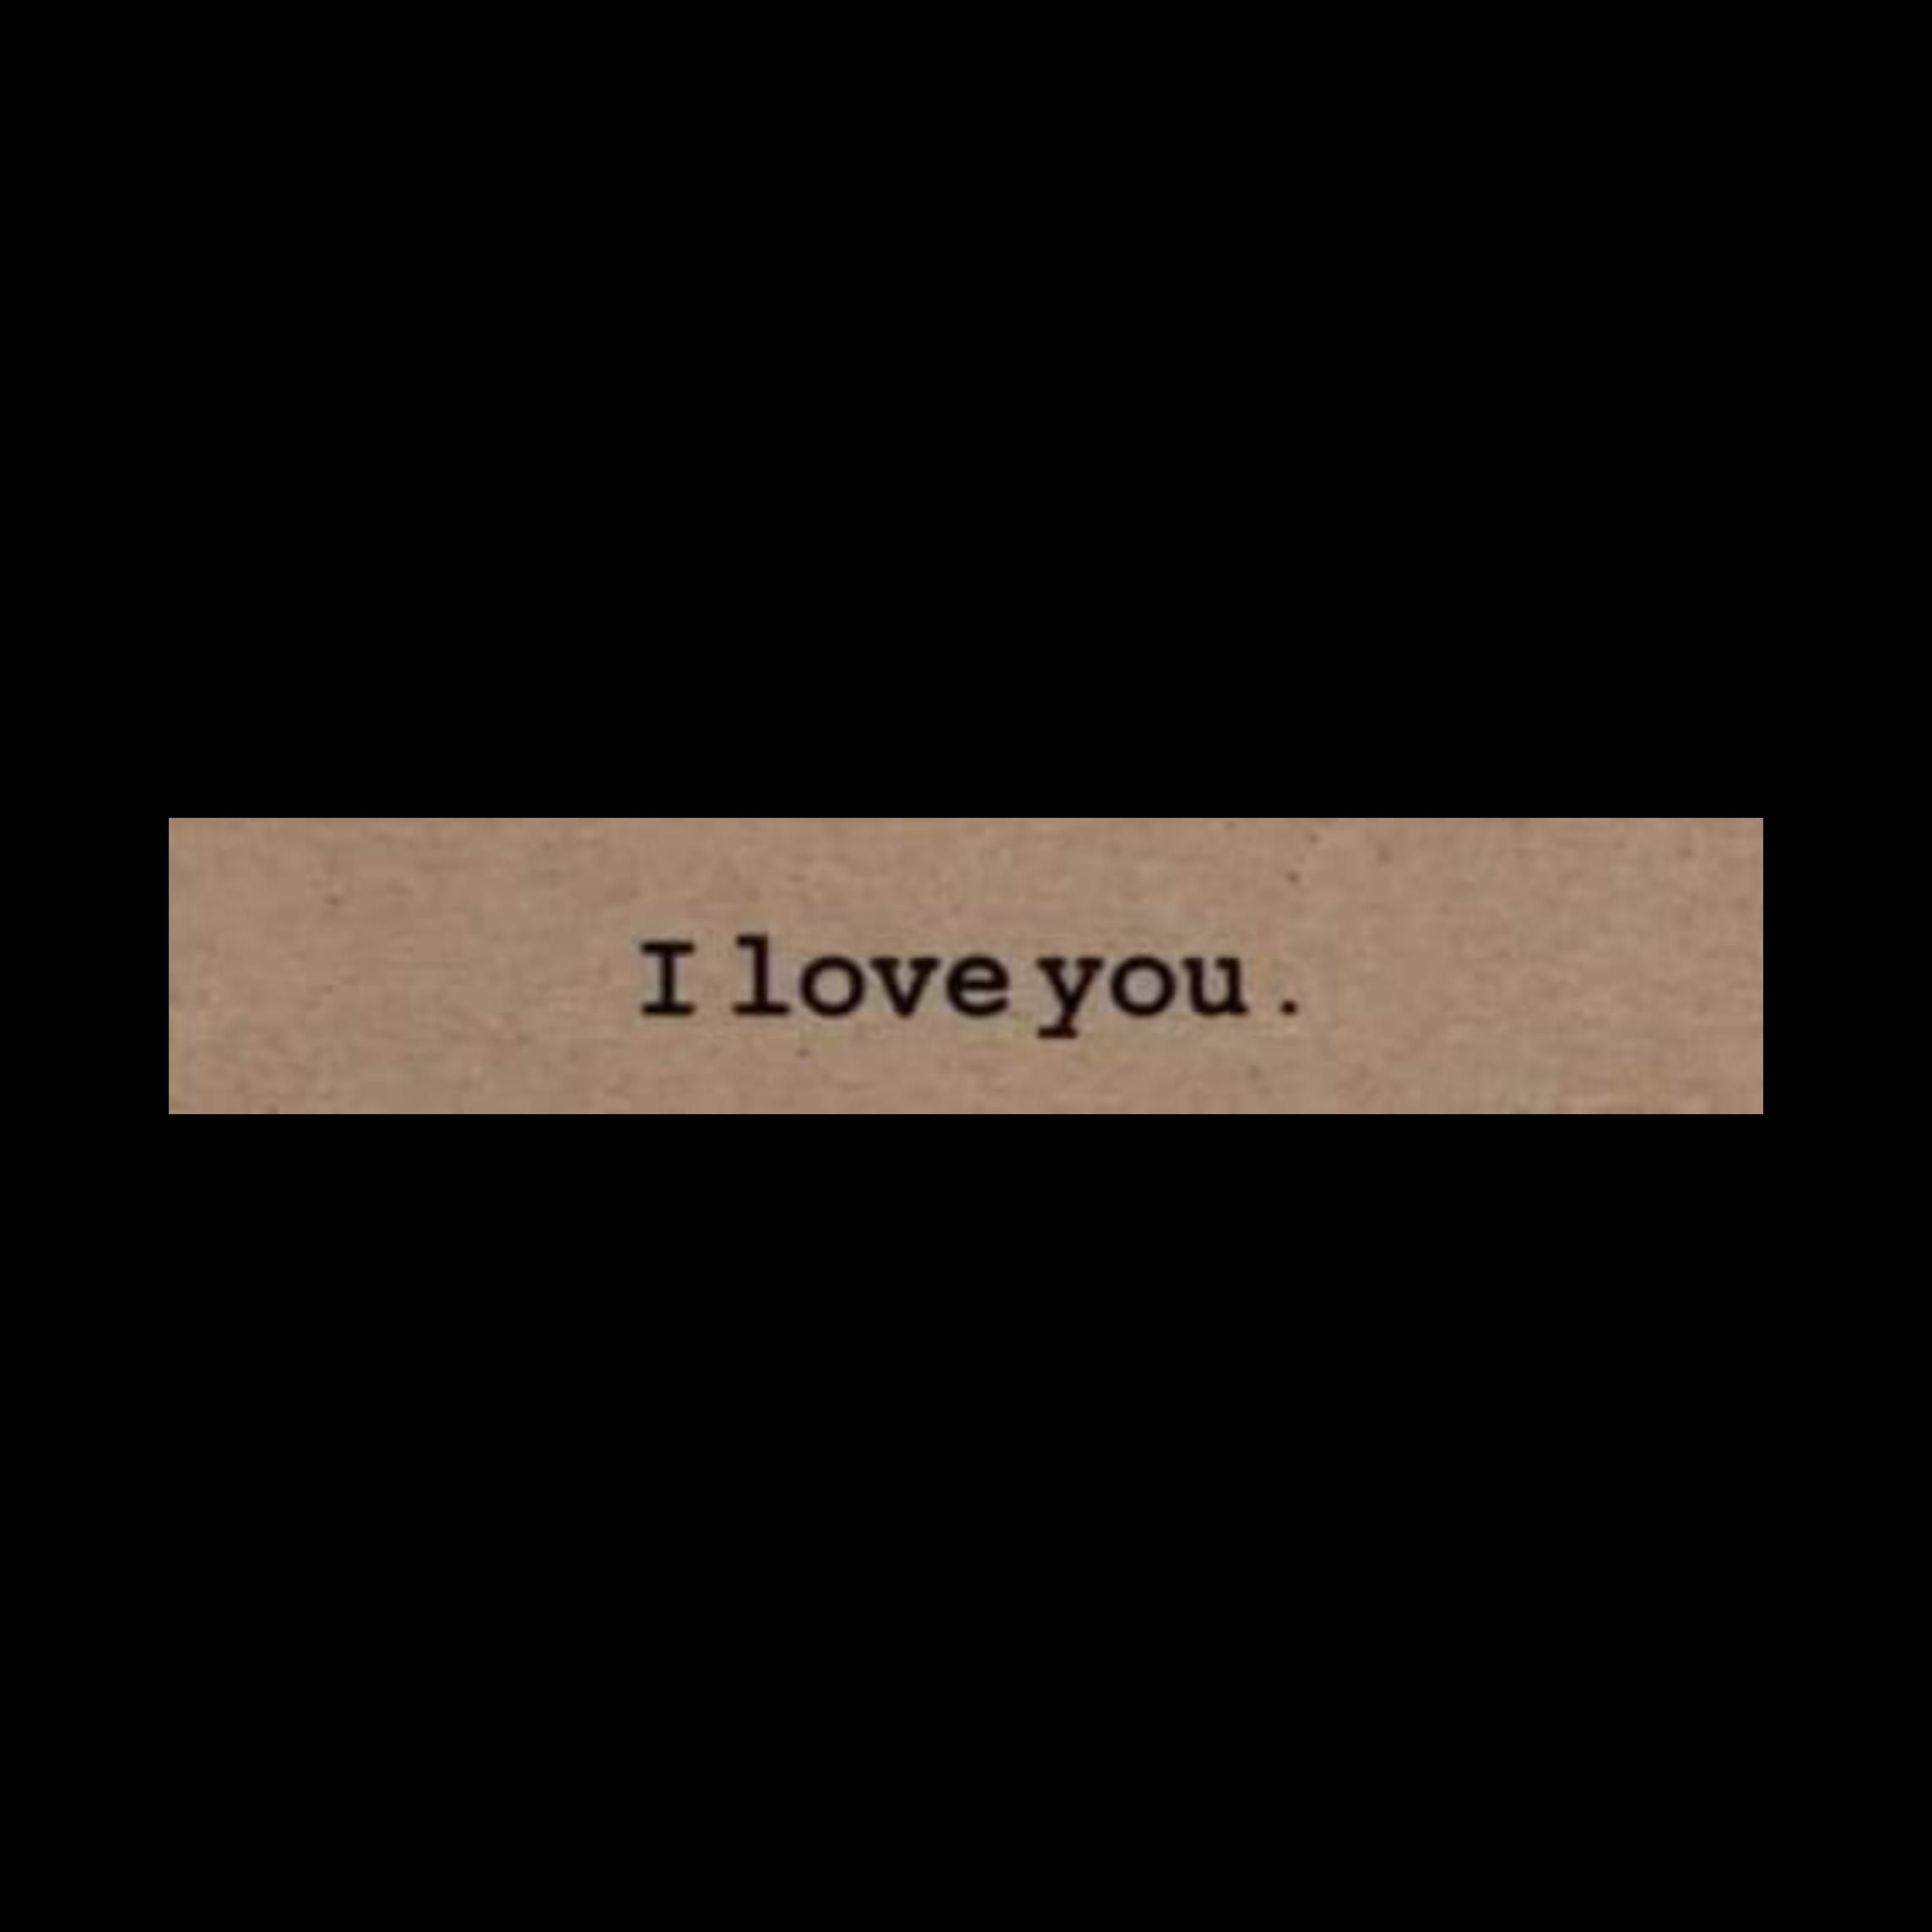 Pin By الملاك البريء On Projects To Try In 2021 Projects To Try Love You My Love